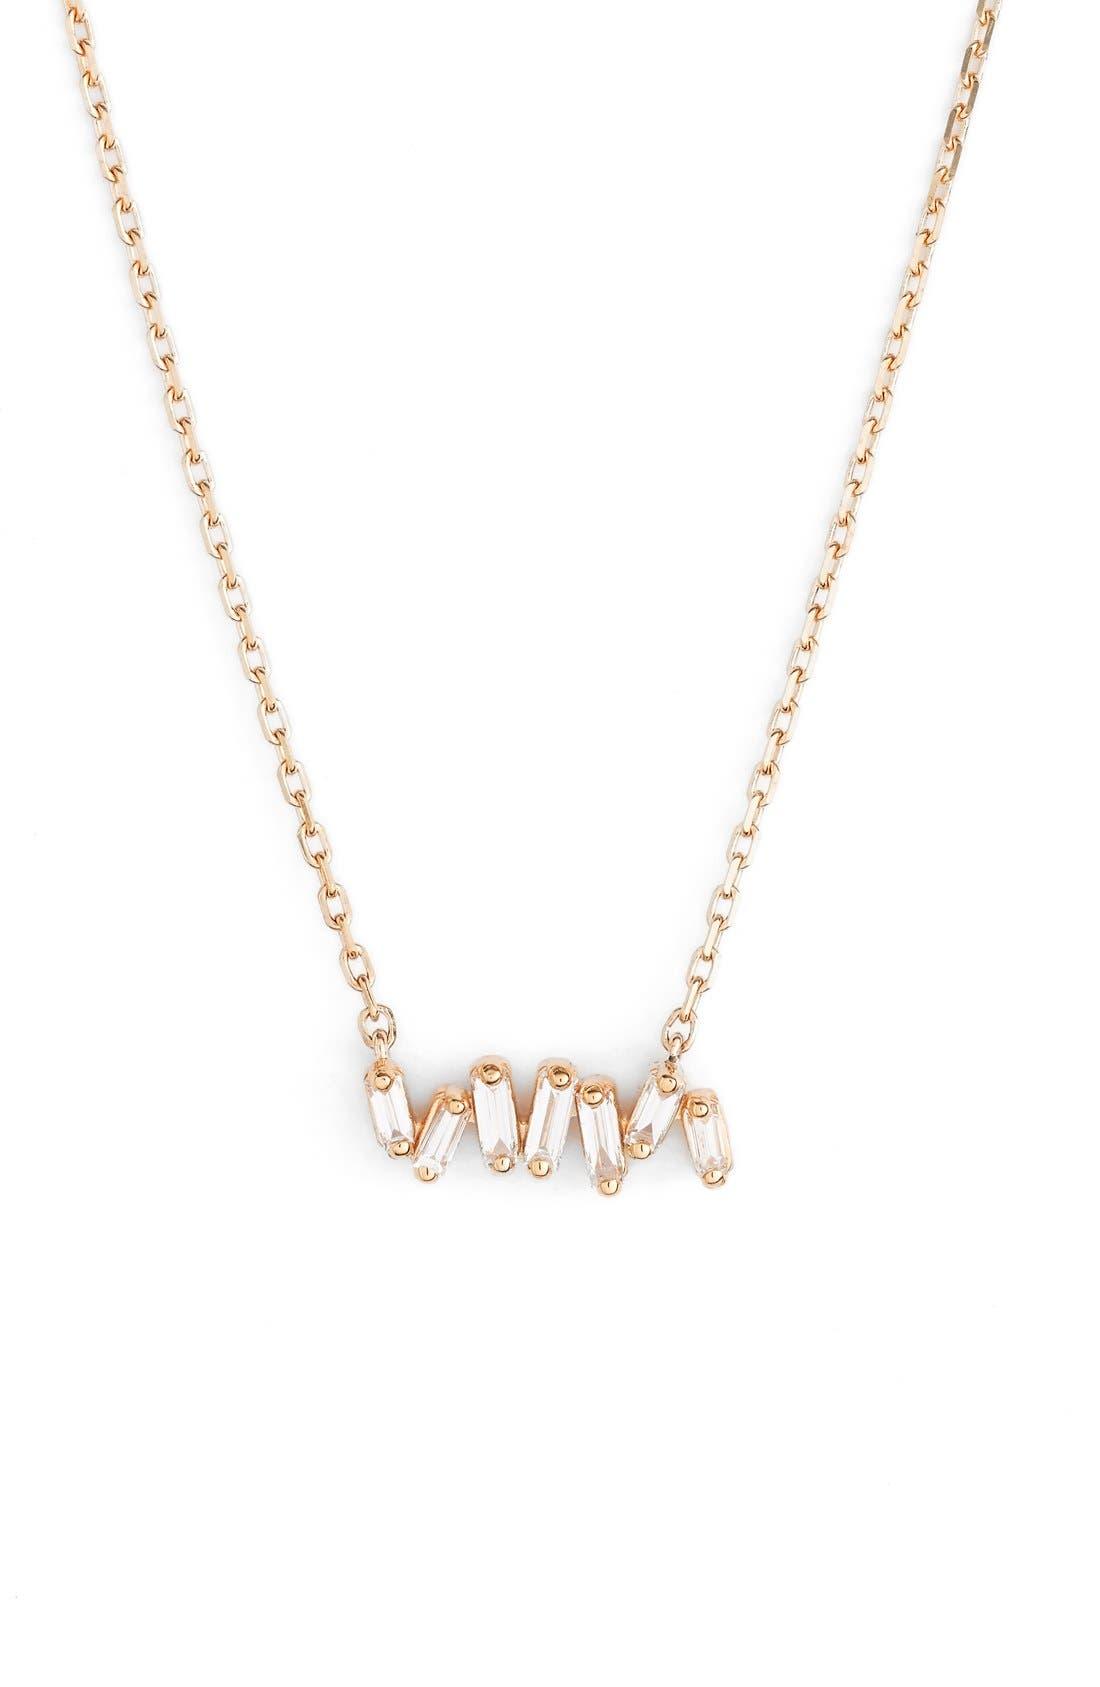 Main Image - Suzanne Kalan 'Fireworks' Diamond Baguette Mini Bar Pendant Necklace